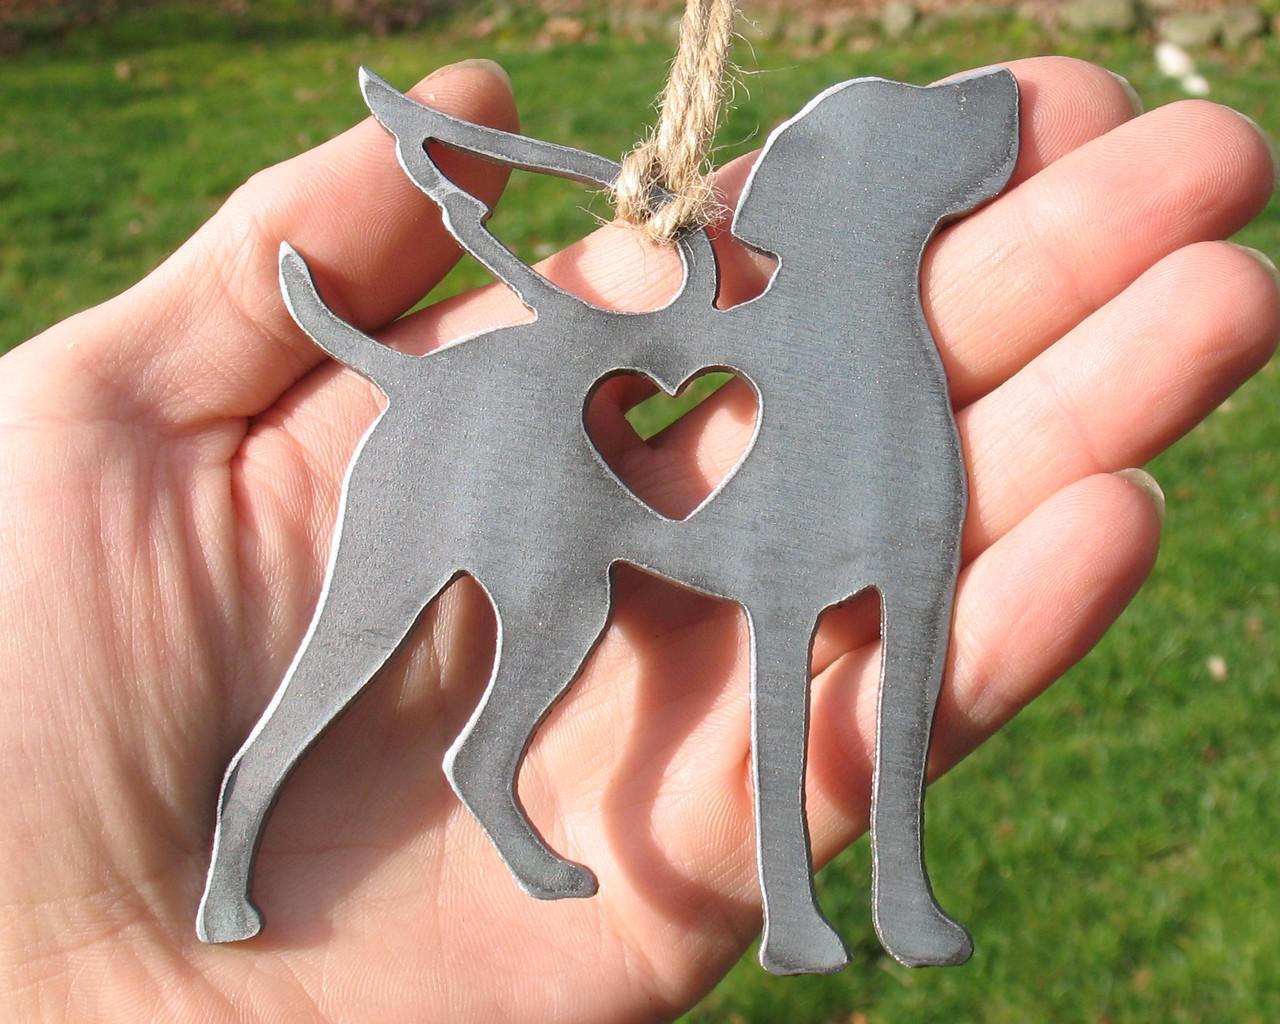 Vizsla Dog Ornament Pet Memorial W/ Angel Wings - Pet Loss Dog Sympathy Remembrance Gift - Metal Dog Christmas Ornament